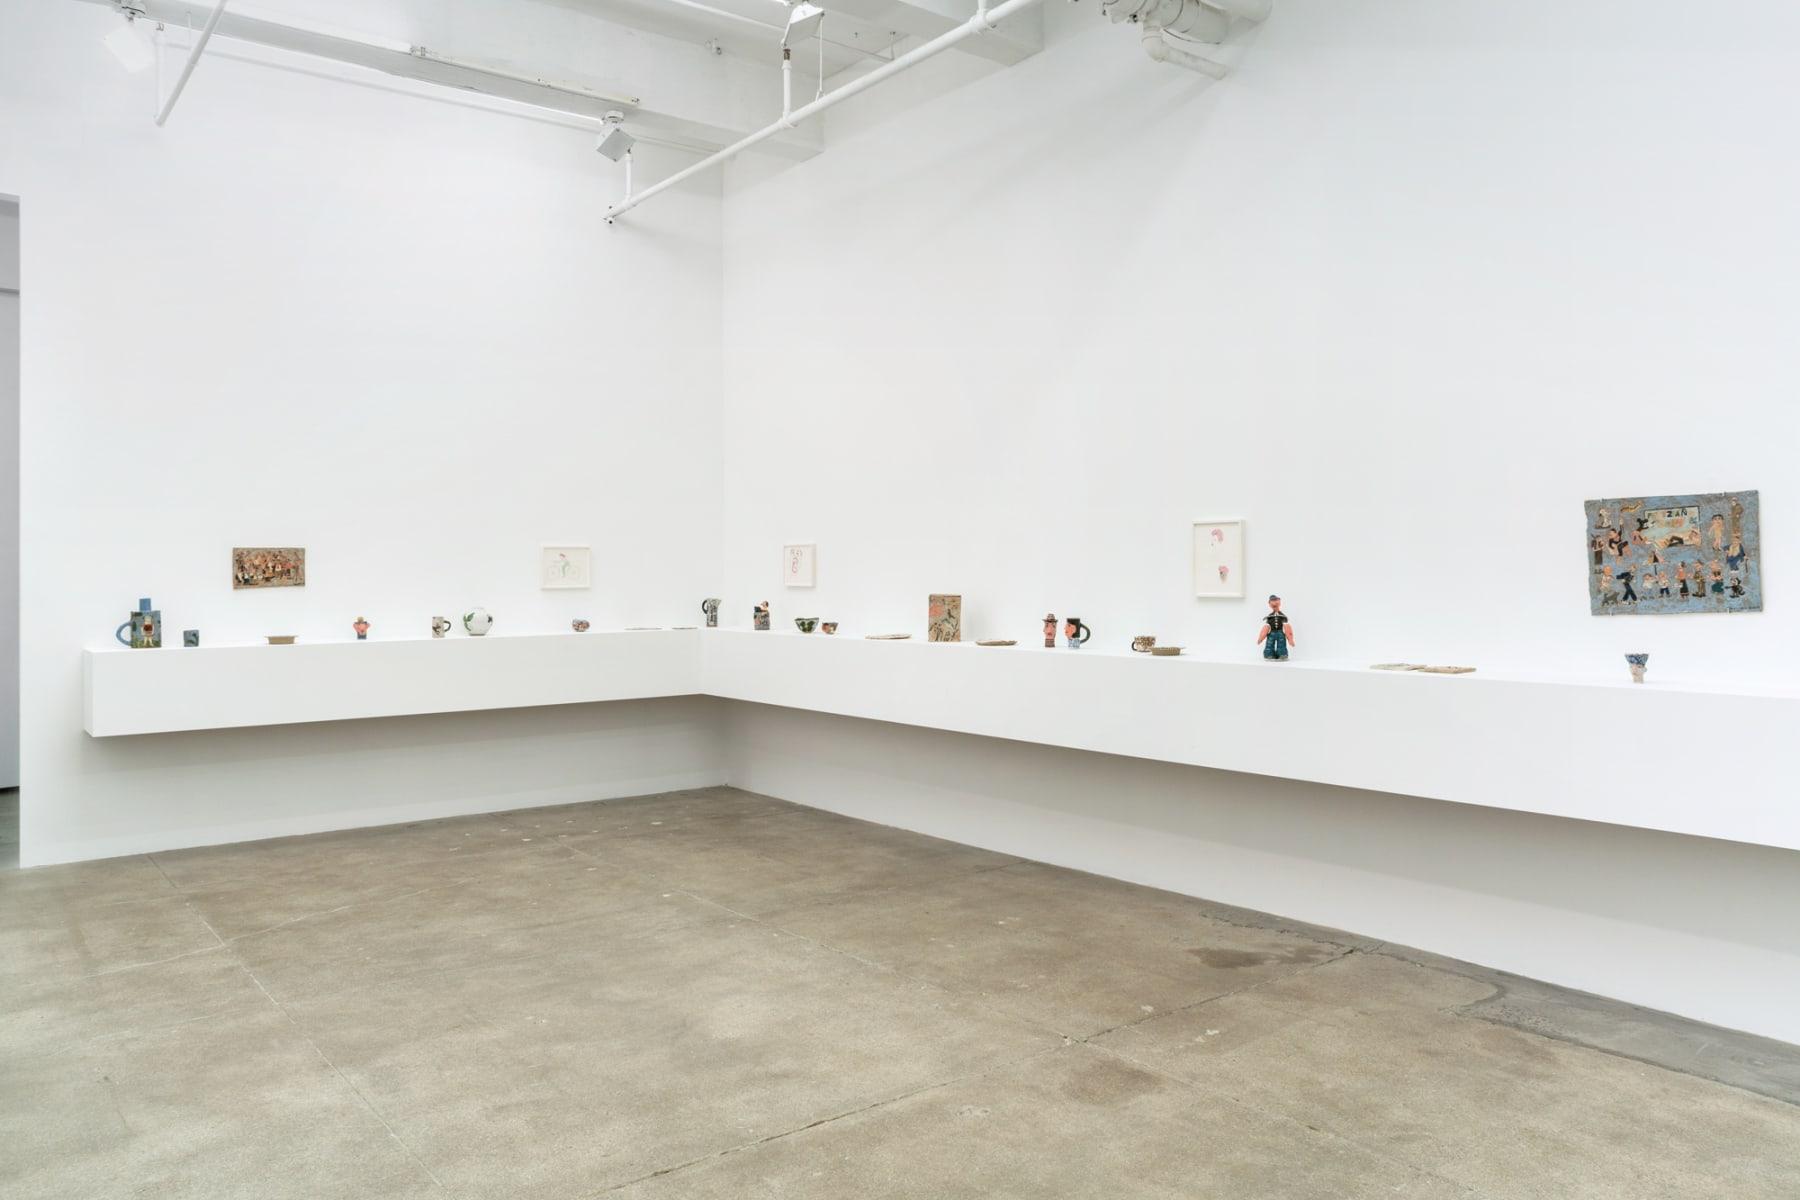 installation view, kaufmann repetto, new york, 2017